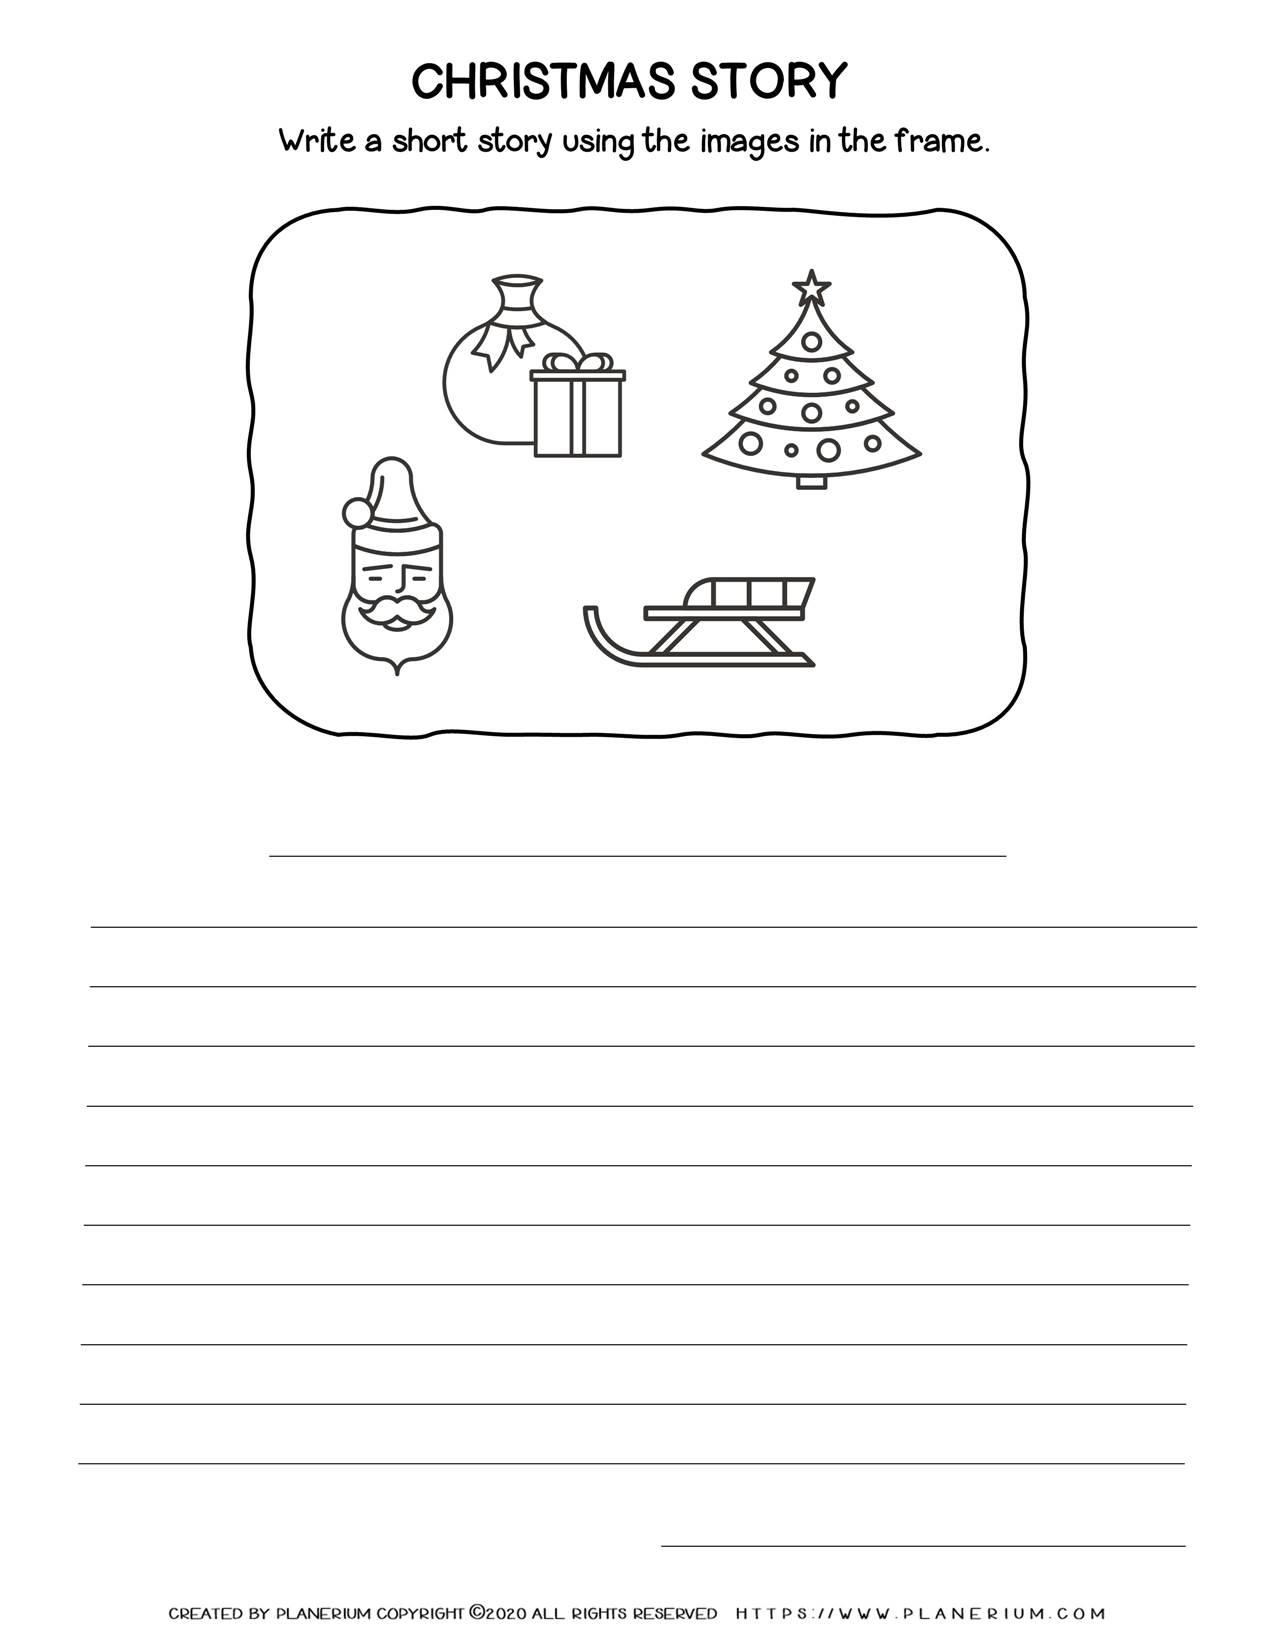 Christmas Worksheet - Narrative Writing | Free Printables | Planerium